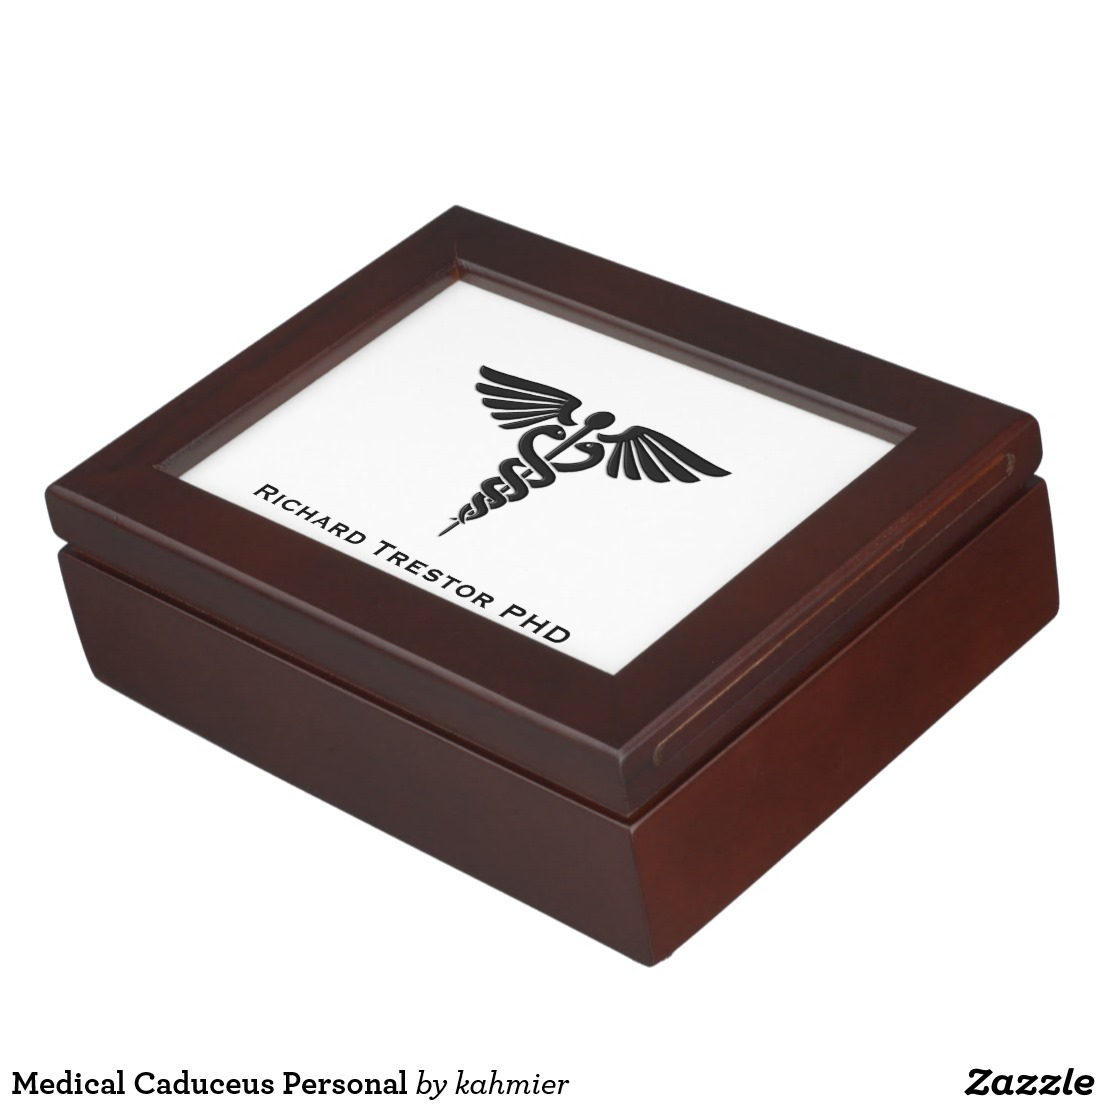 Medical Caduceus Personal Keepsake Box